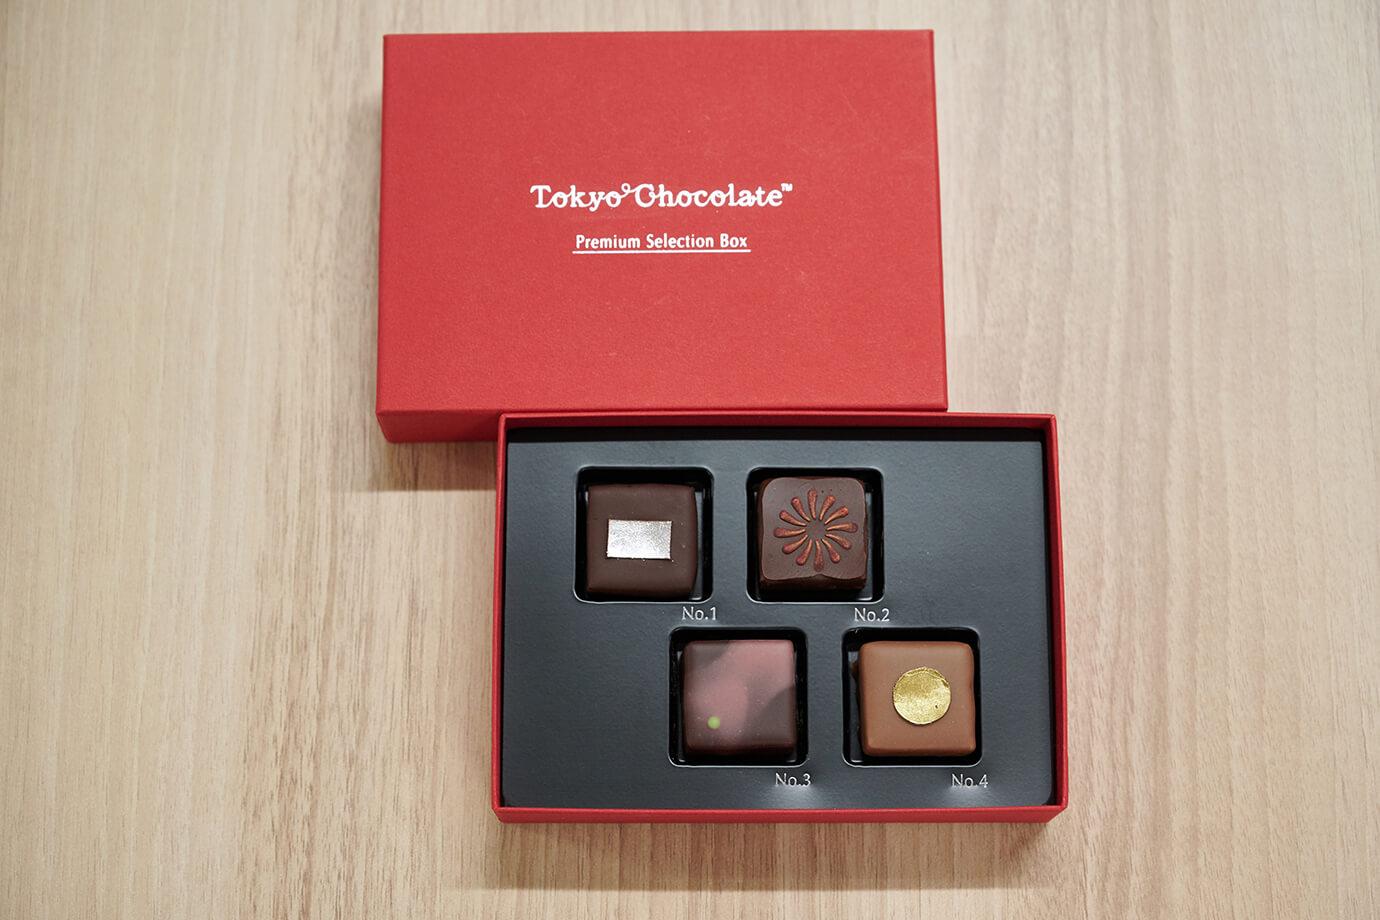 ≪Tokyo Chocolate(トーキョーチョコレート)≫トーキョーチョコレートプレミアムセレクションボックス